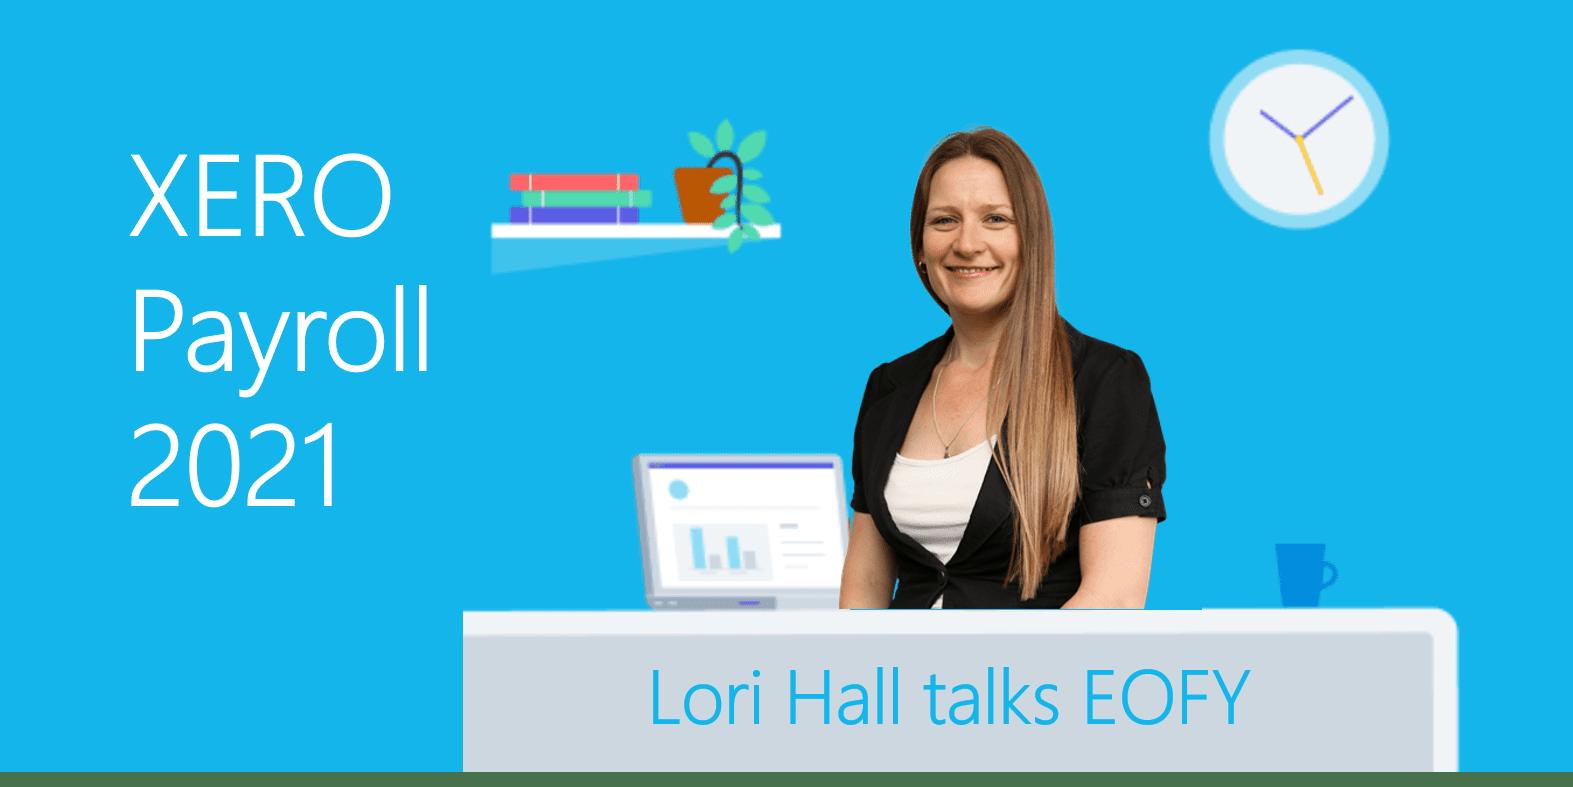 XERO Payroll 2021 – Lori Hall talks EOFY